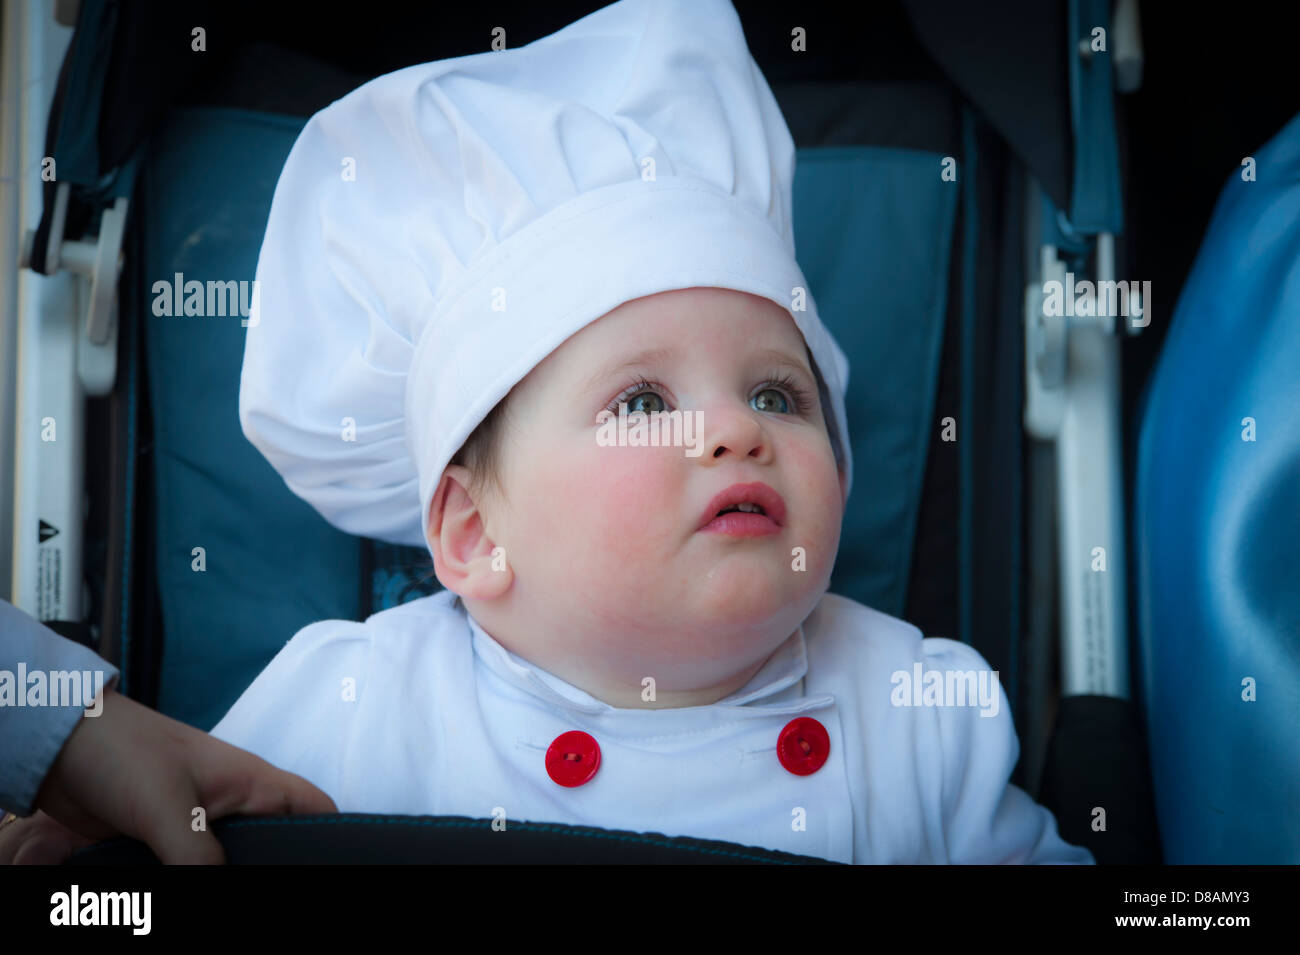 Baby in Purim costume Photographed in Bnei Brak, Israel - Stock Image